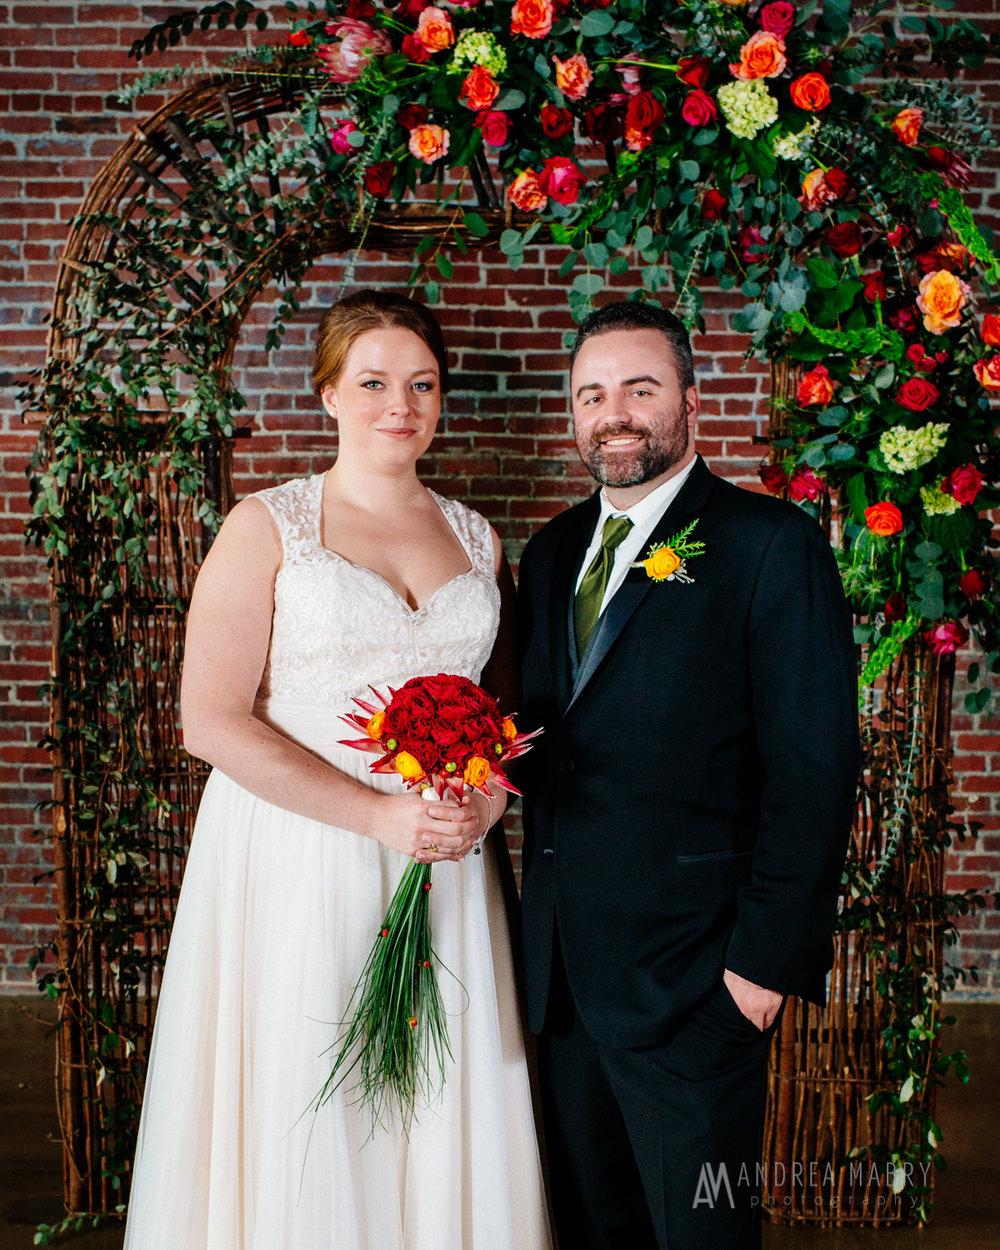 20171028-sarahmiller-wed-blog-035-0751.jpg